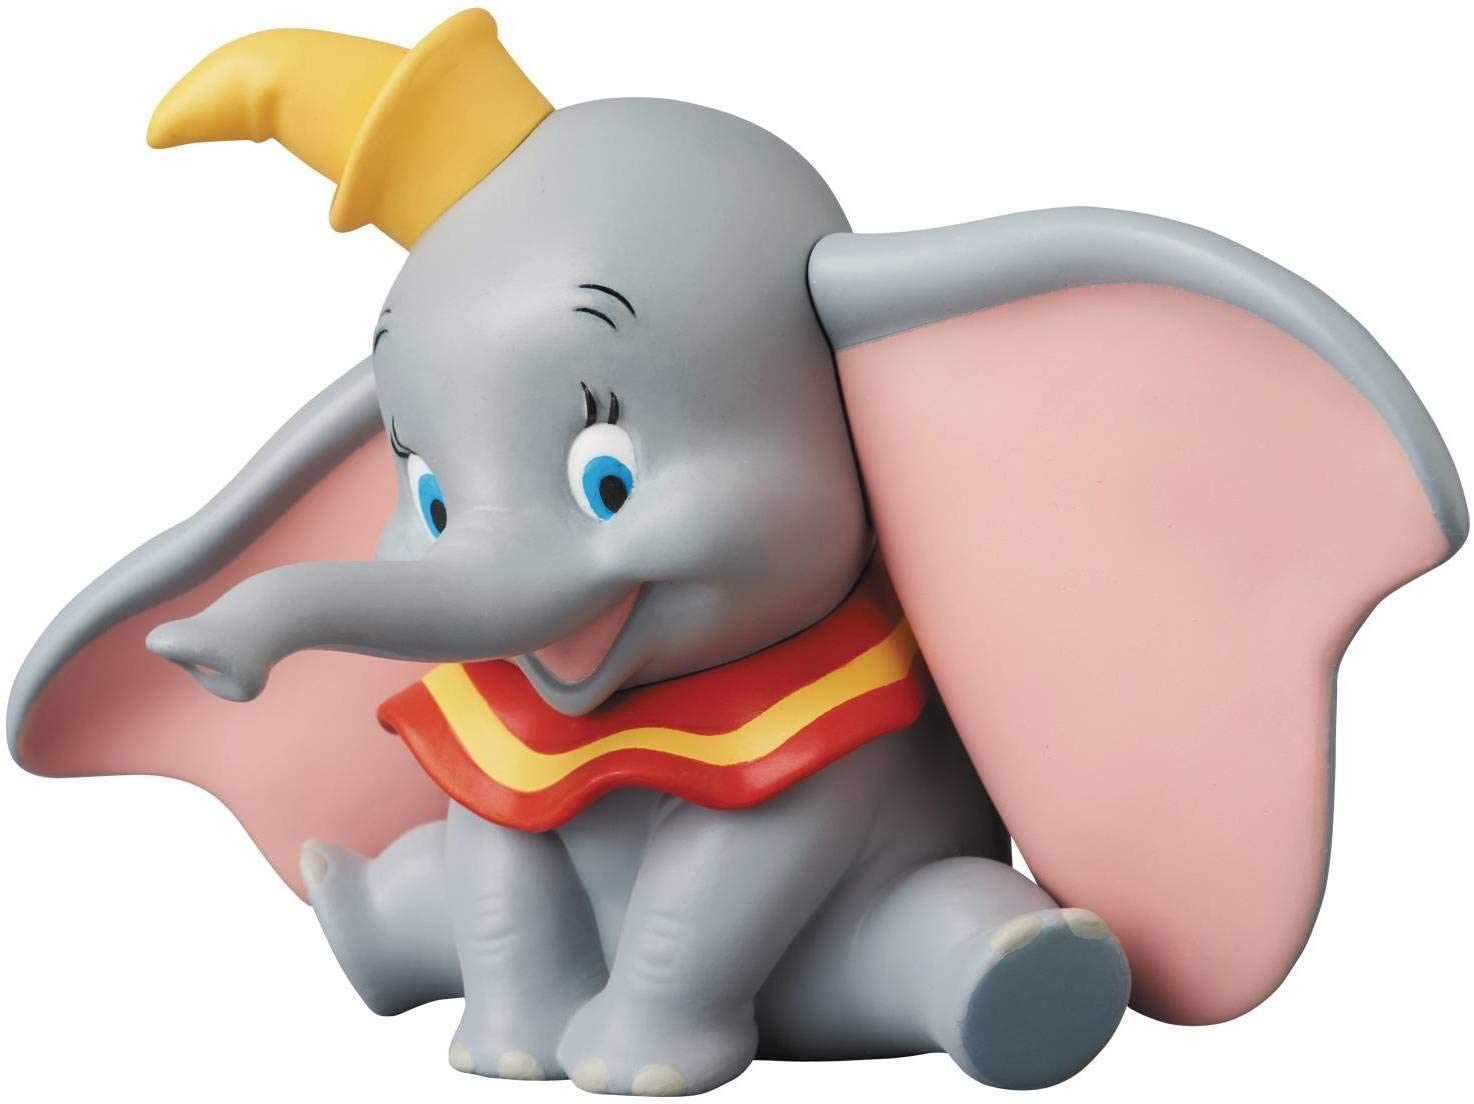 Medicom Disney Dumbo Ultra Detail Figure 7cm Oficial Licenciado